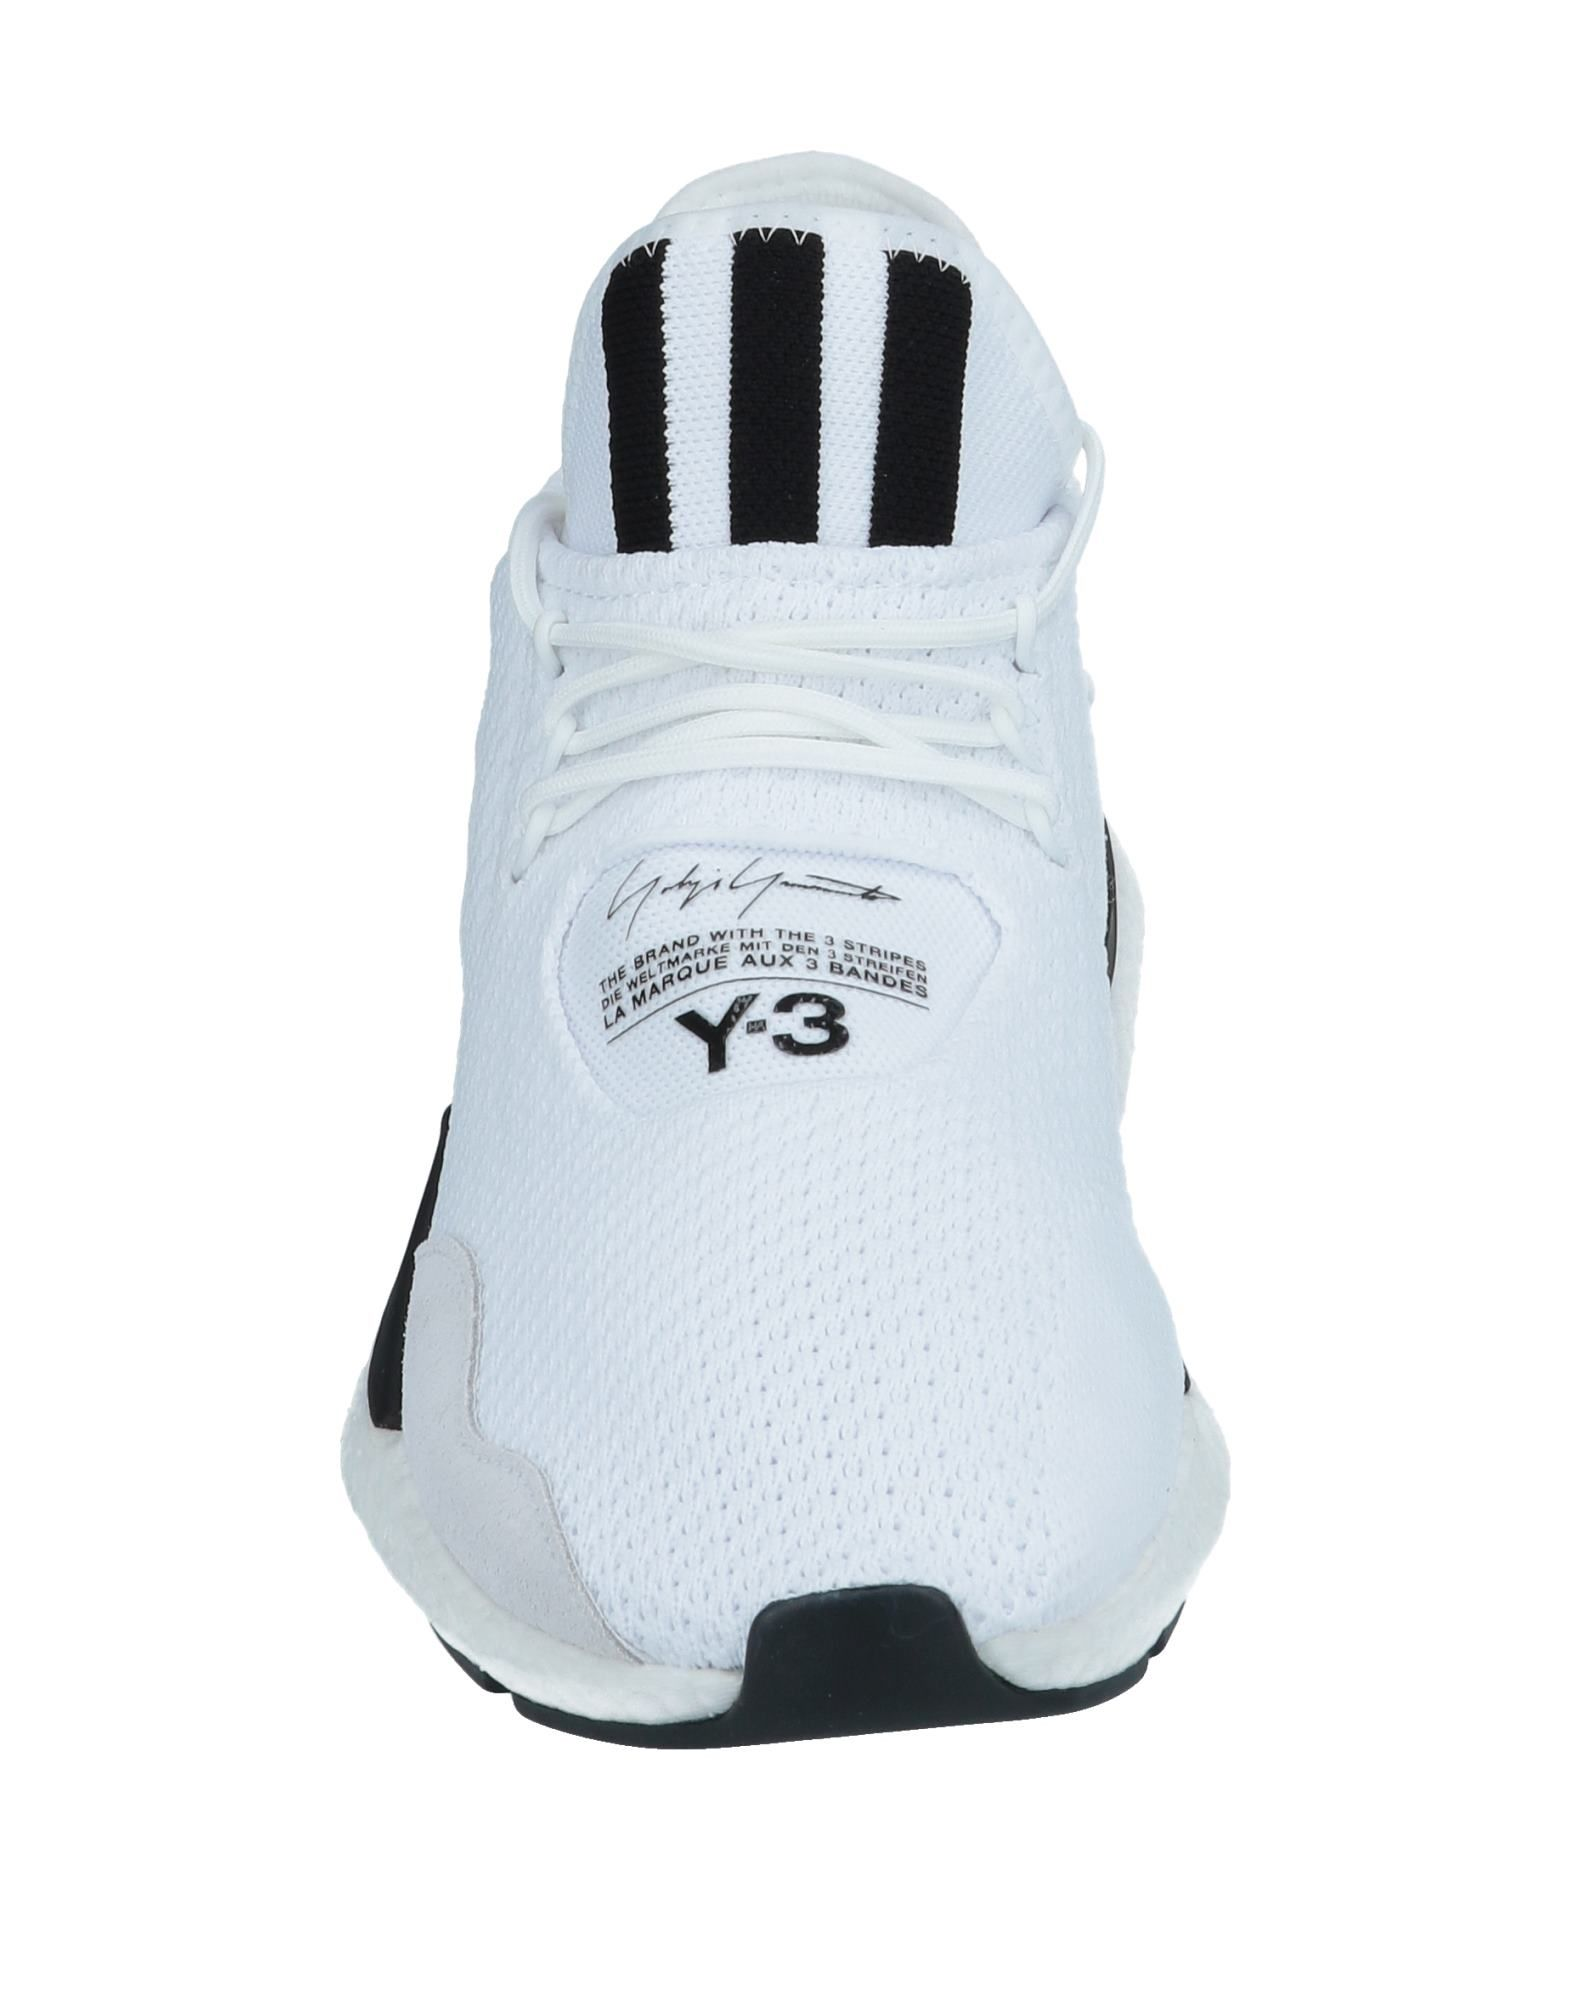 Adidas Adidas Adidas By Yohji Yamamoto Sneakers Herren Gutes Preis-Leistungs-Verhältnis, es lohnt sich c6681d